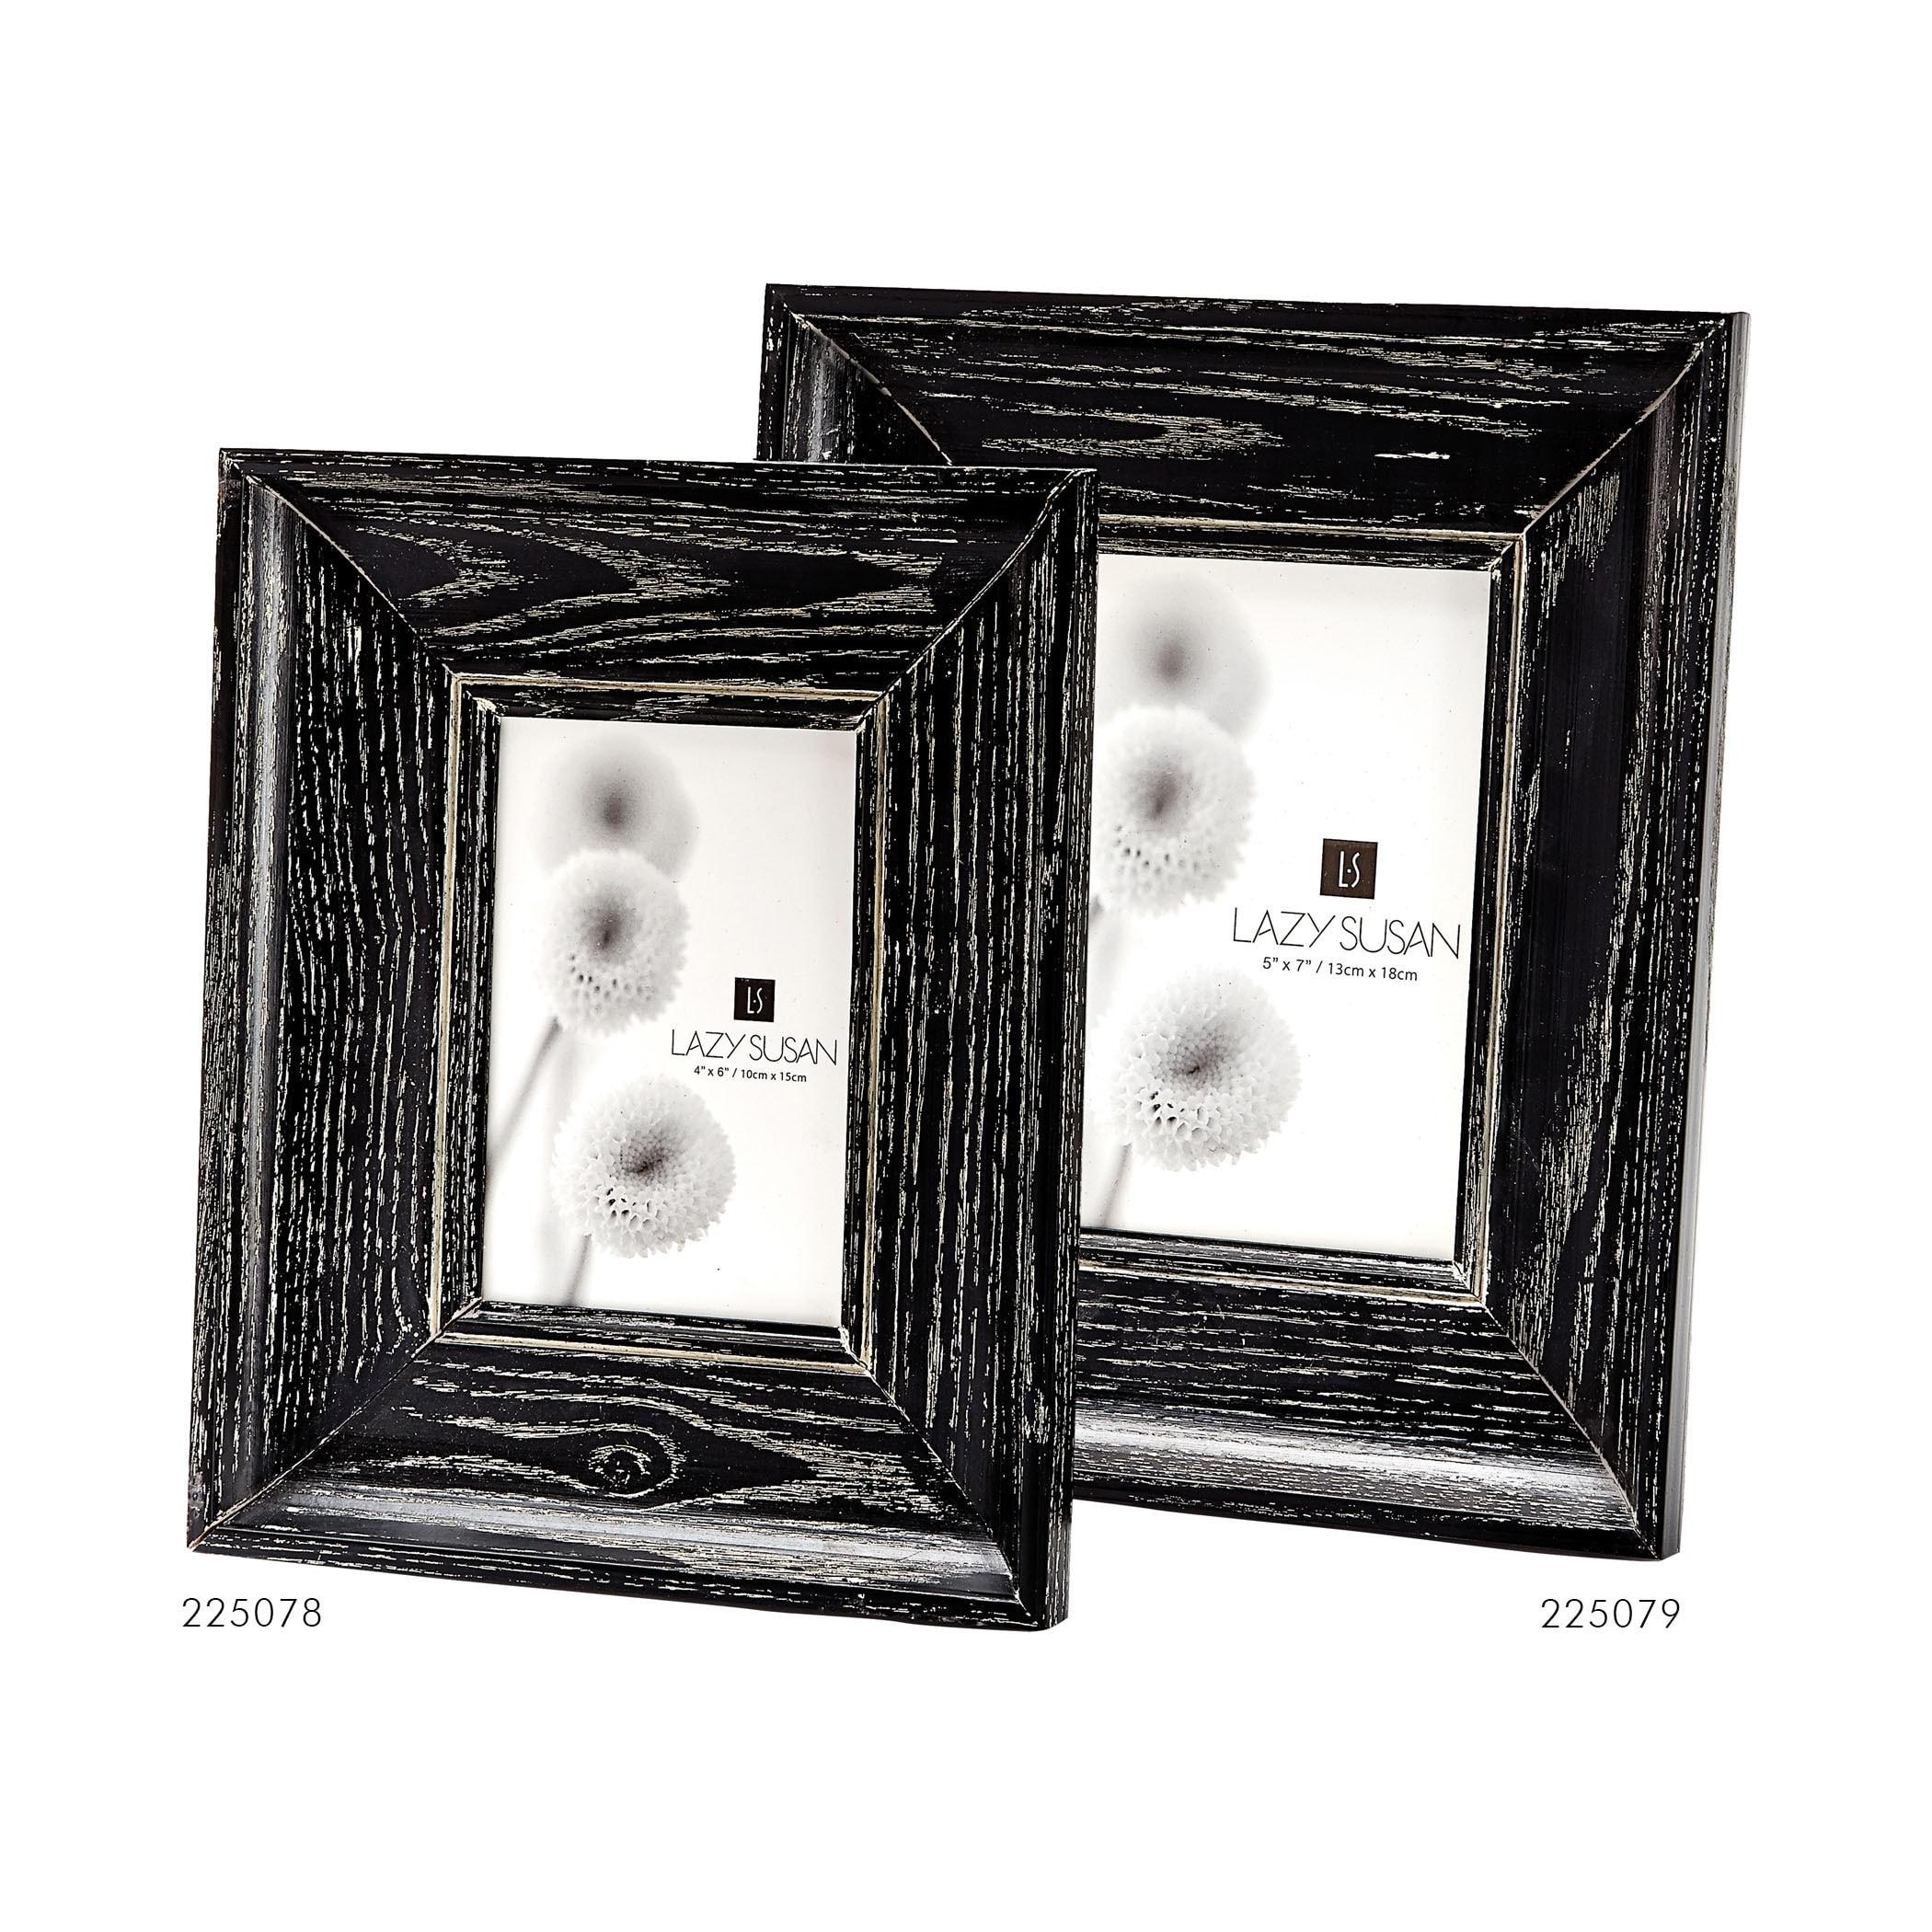 Dimond home oak cerused black convex 5x7 frame free shipping dimond home oak cerused black convex 5x7 frame free shipping today overstock 17542174 jeuxipadfo Images